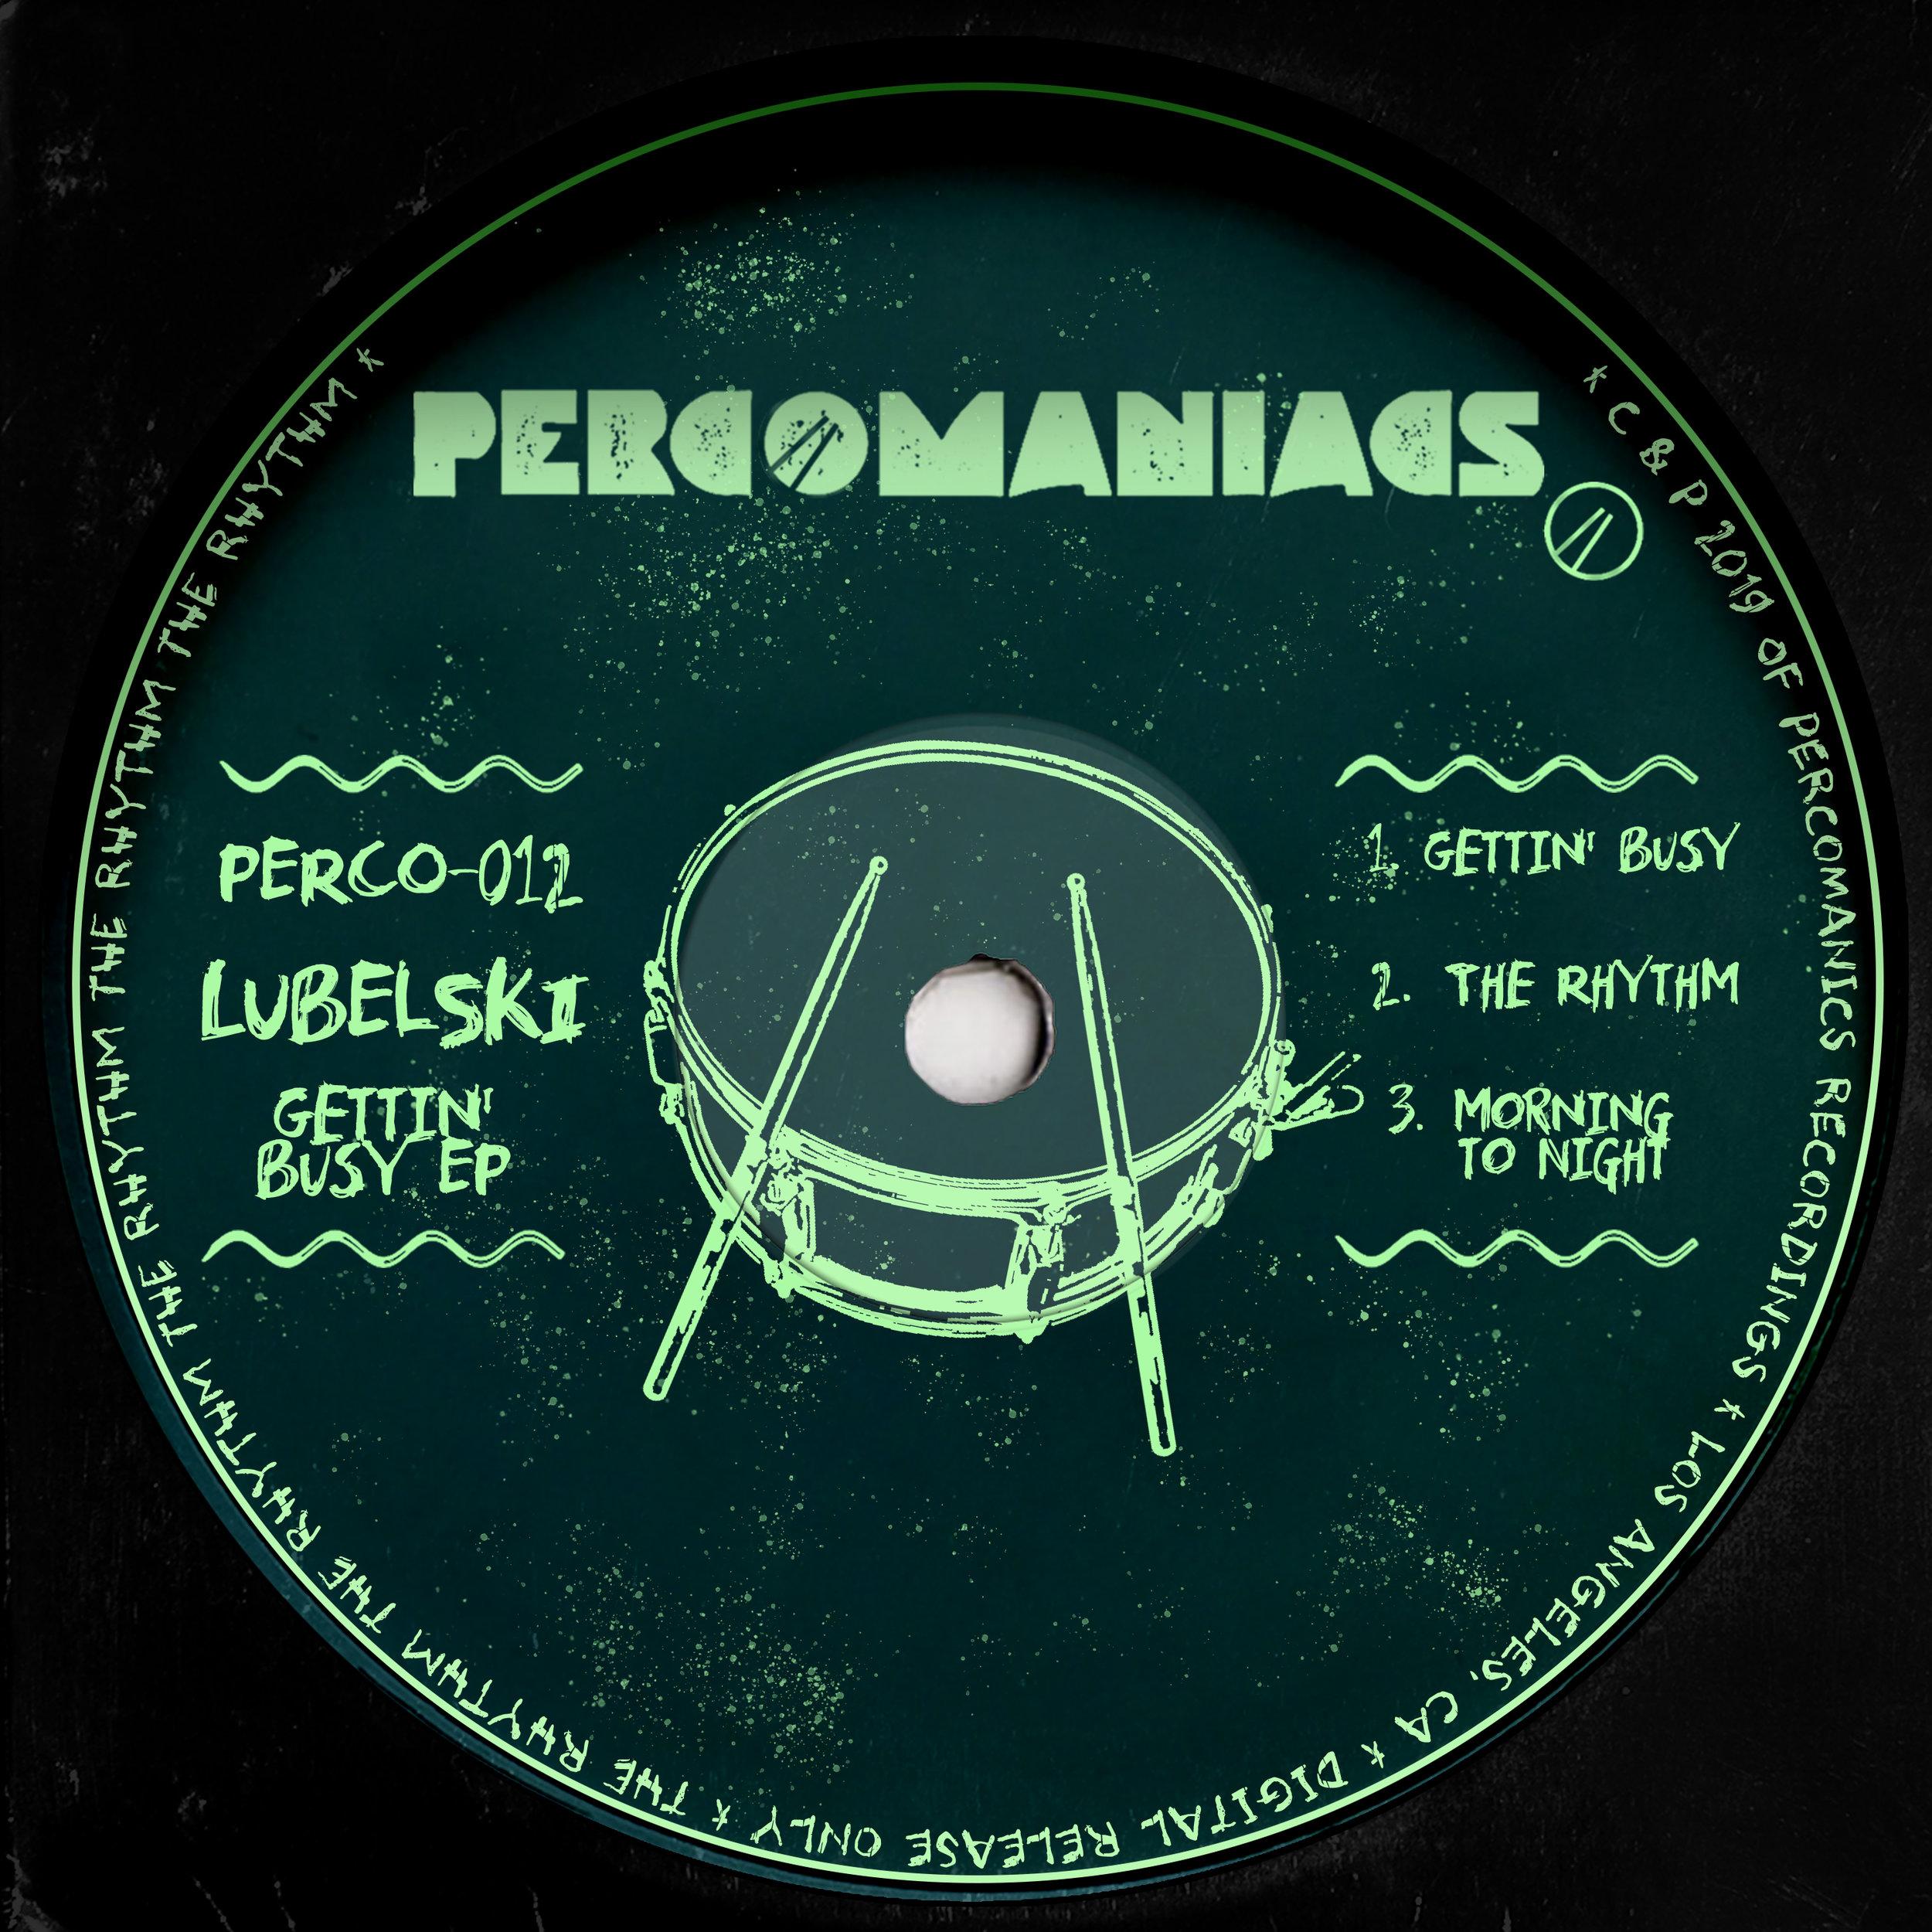 PERCO012 - LUBELSKI - GETTIN BUSY EP